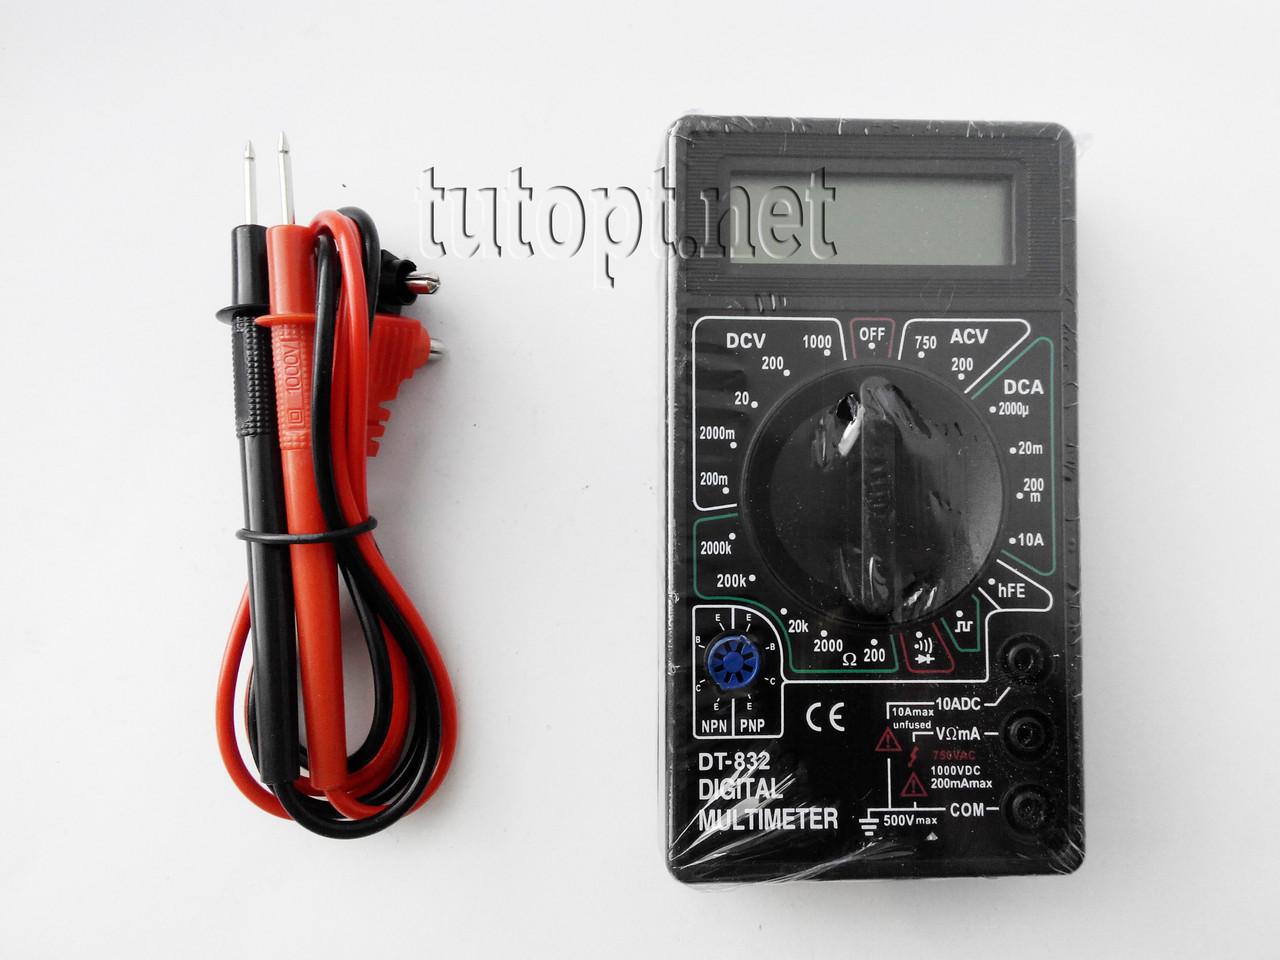 Мультиметр DT-832 (Тестер), типы измерений - DCV, АCV, DCA, АCA, Ом, Звуковая прозвонка.